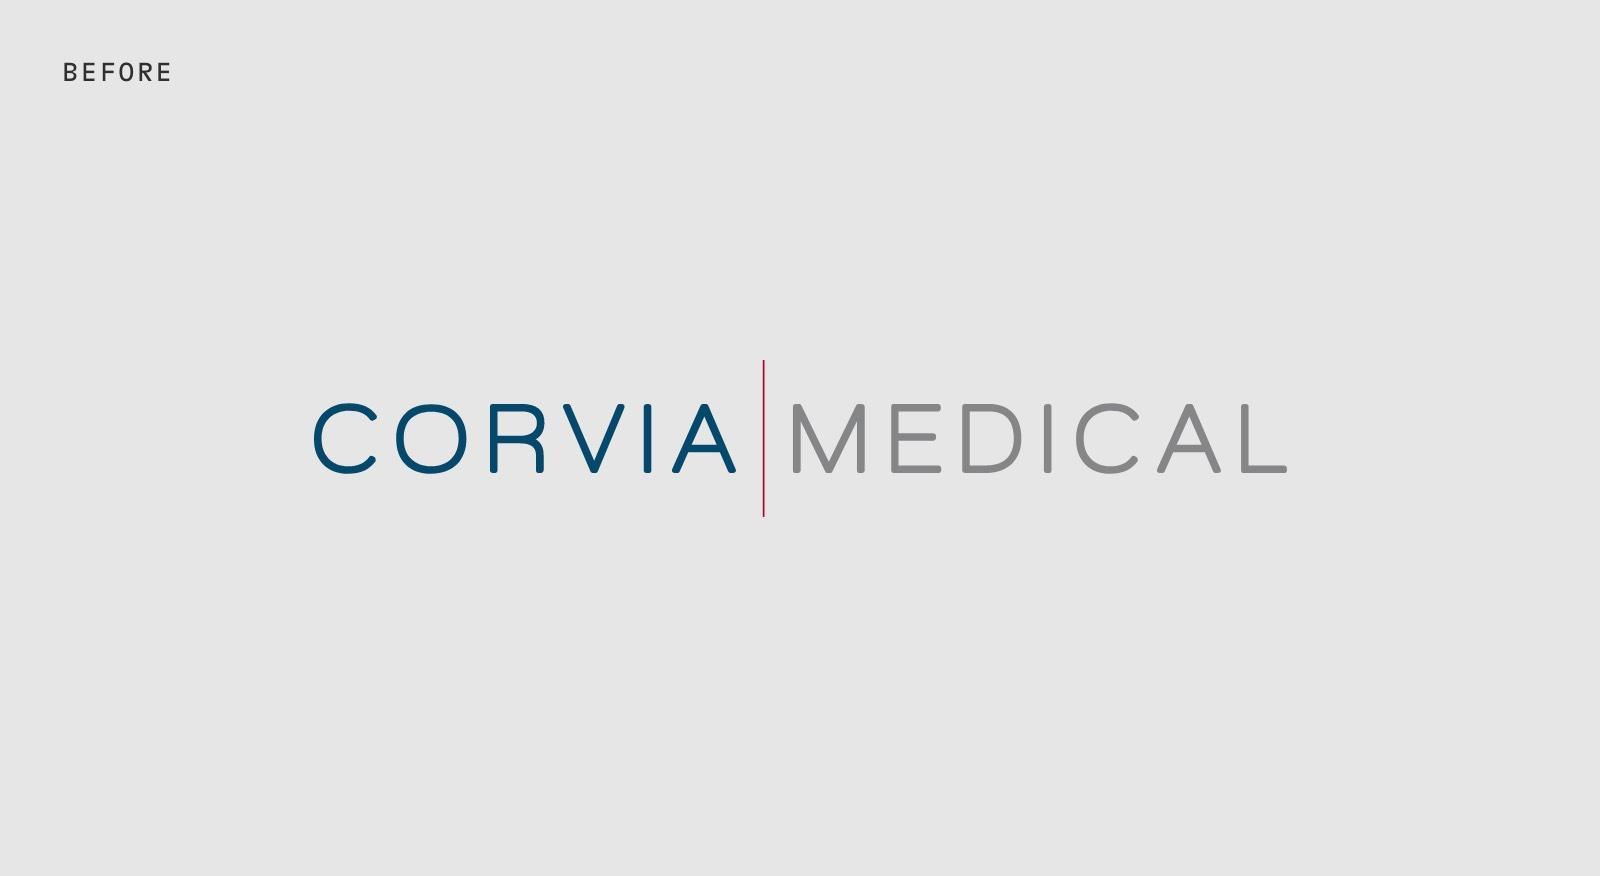 Corvia Medical Logo - Before